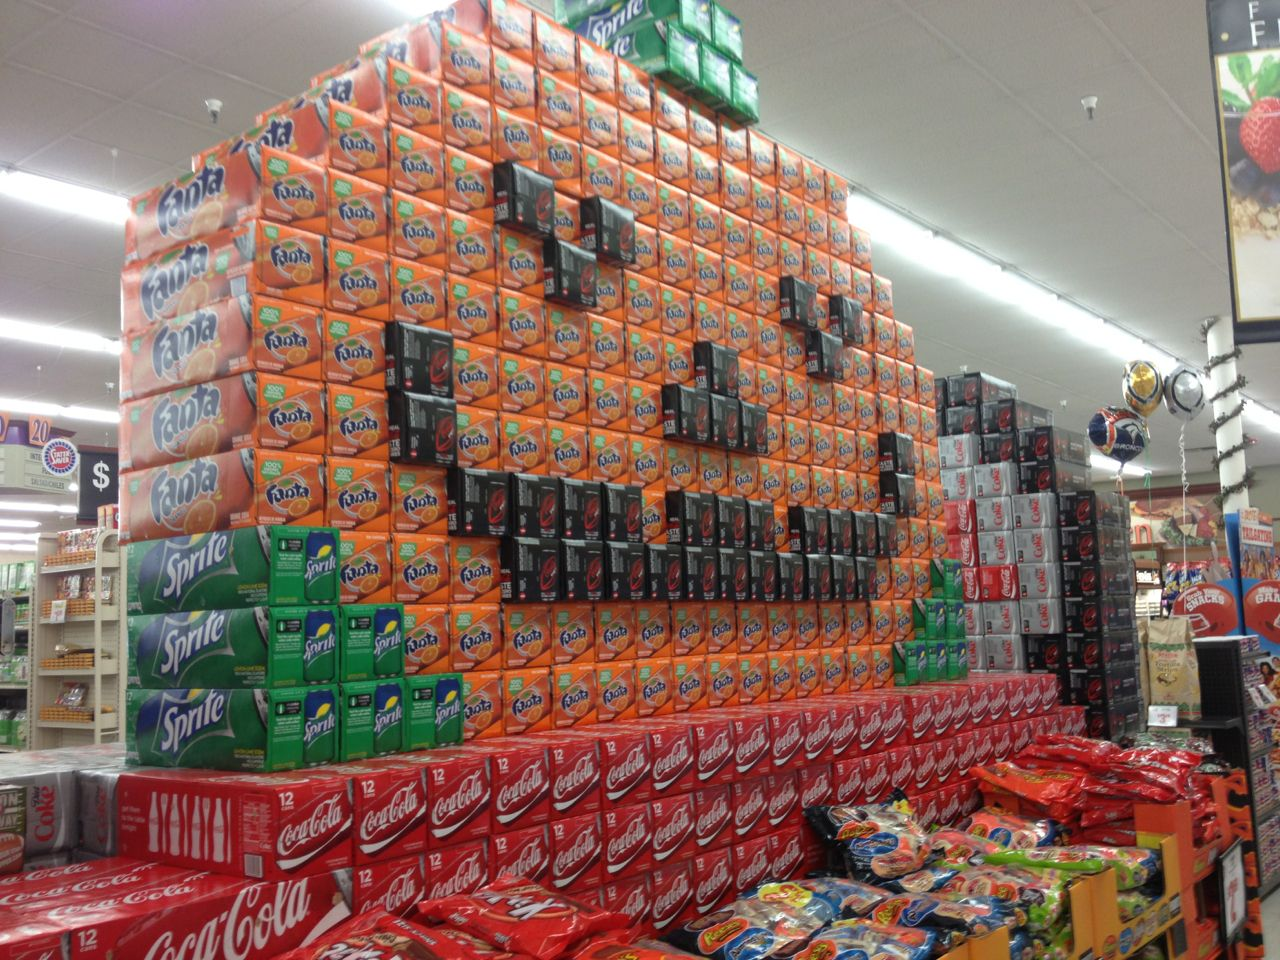 Pop Displays In Store